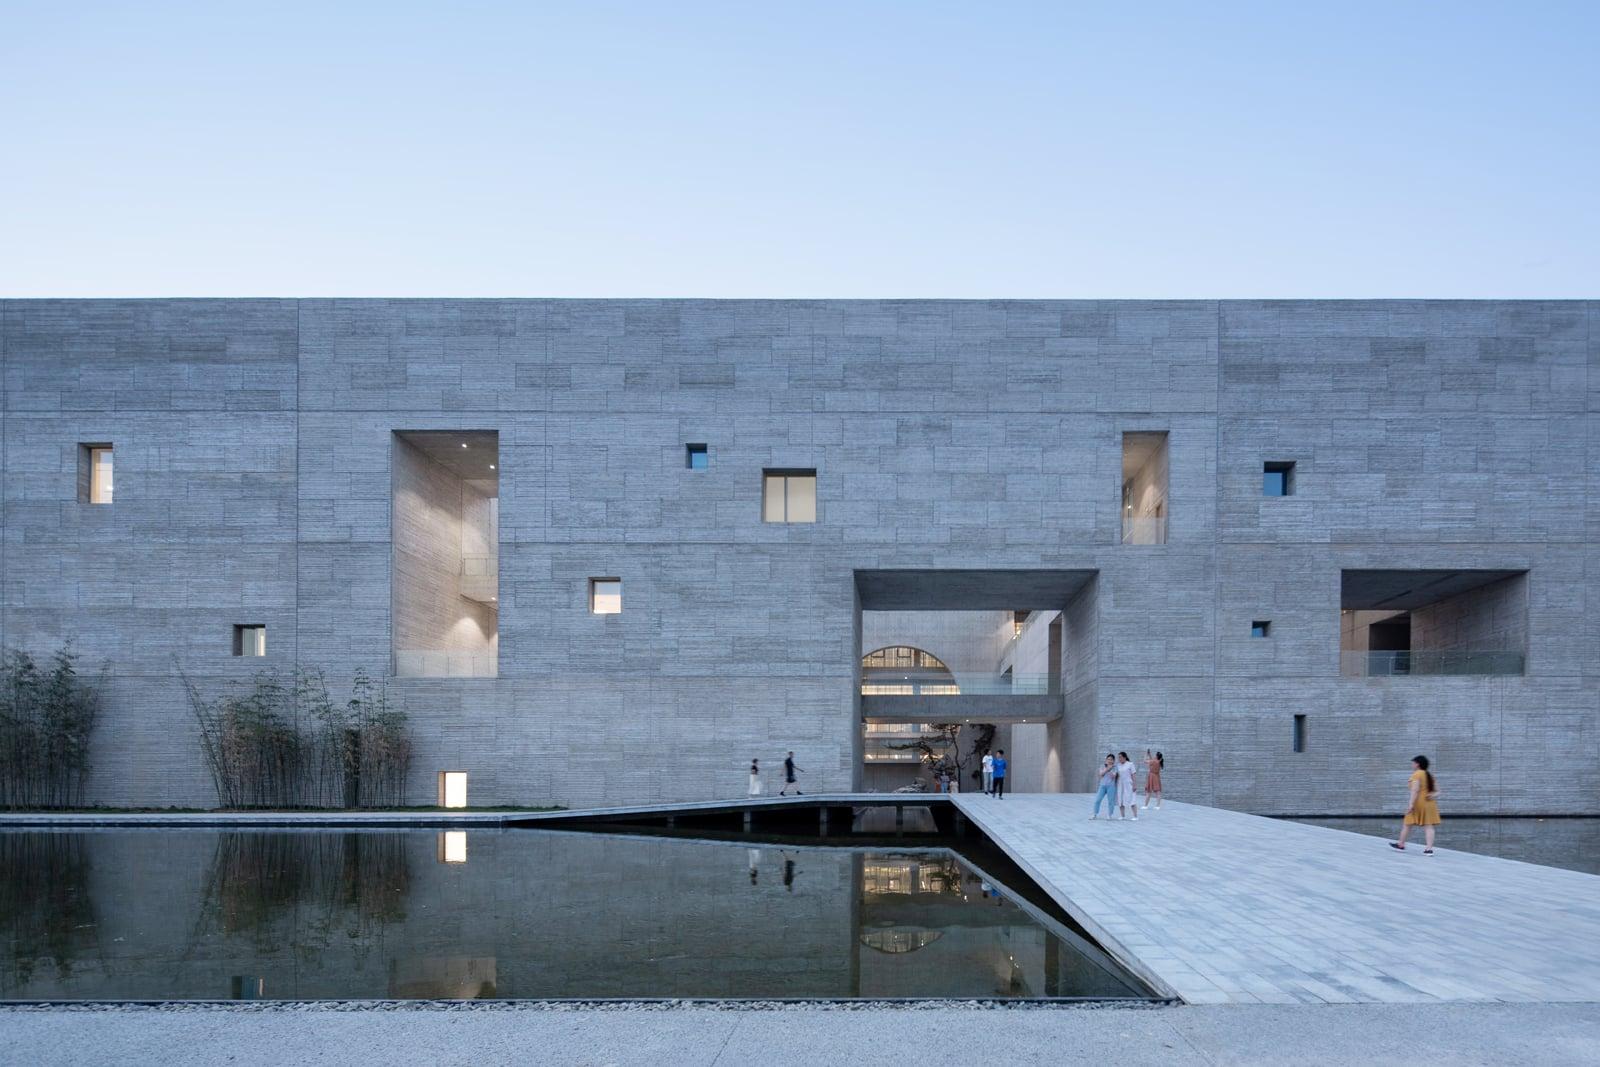 Shou County Culture and Art Center  - 20210702 Zhu Pei ShouCountyCultureArtCenter 01 31